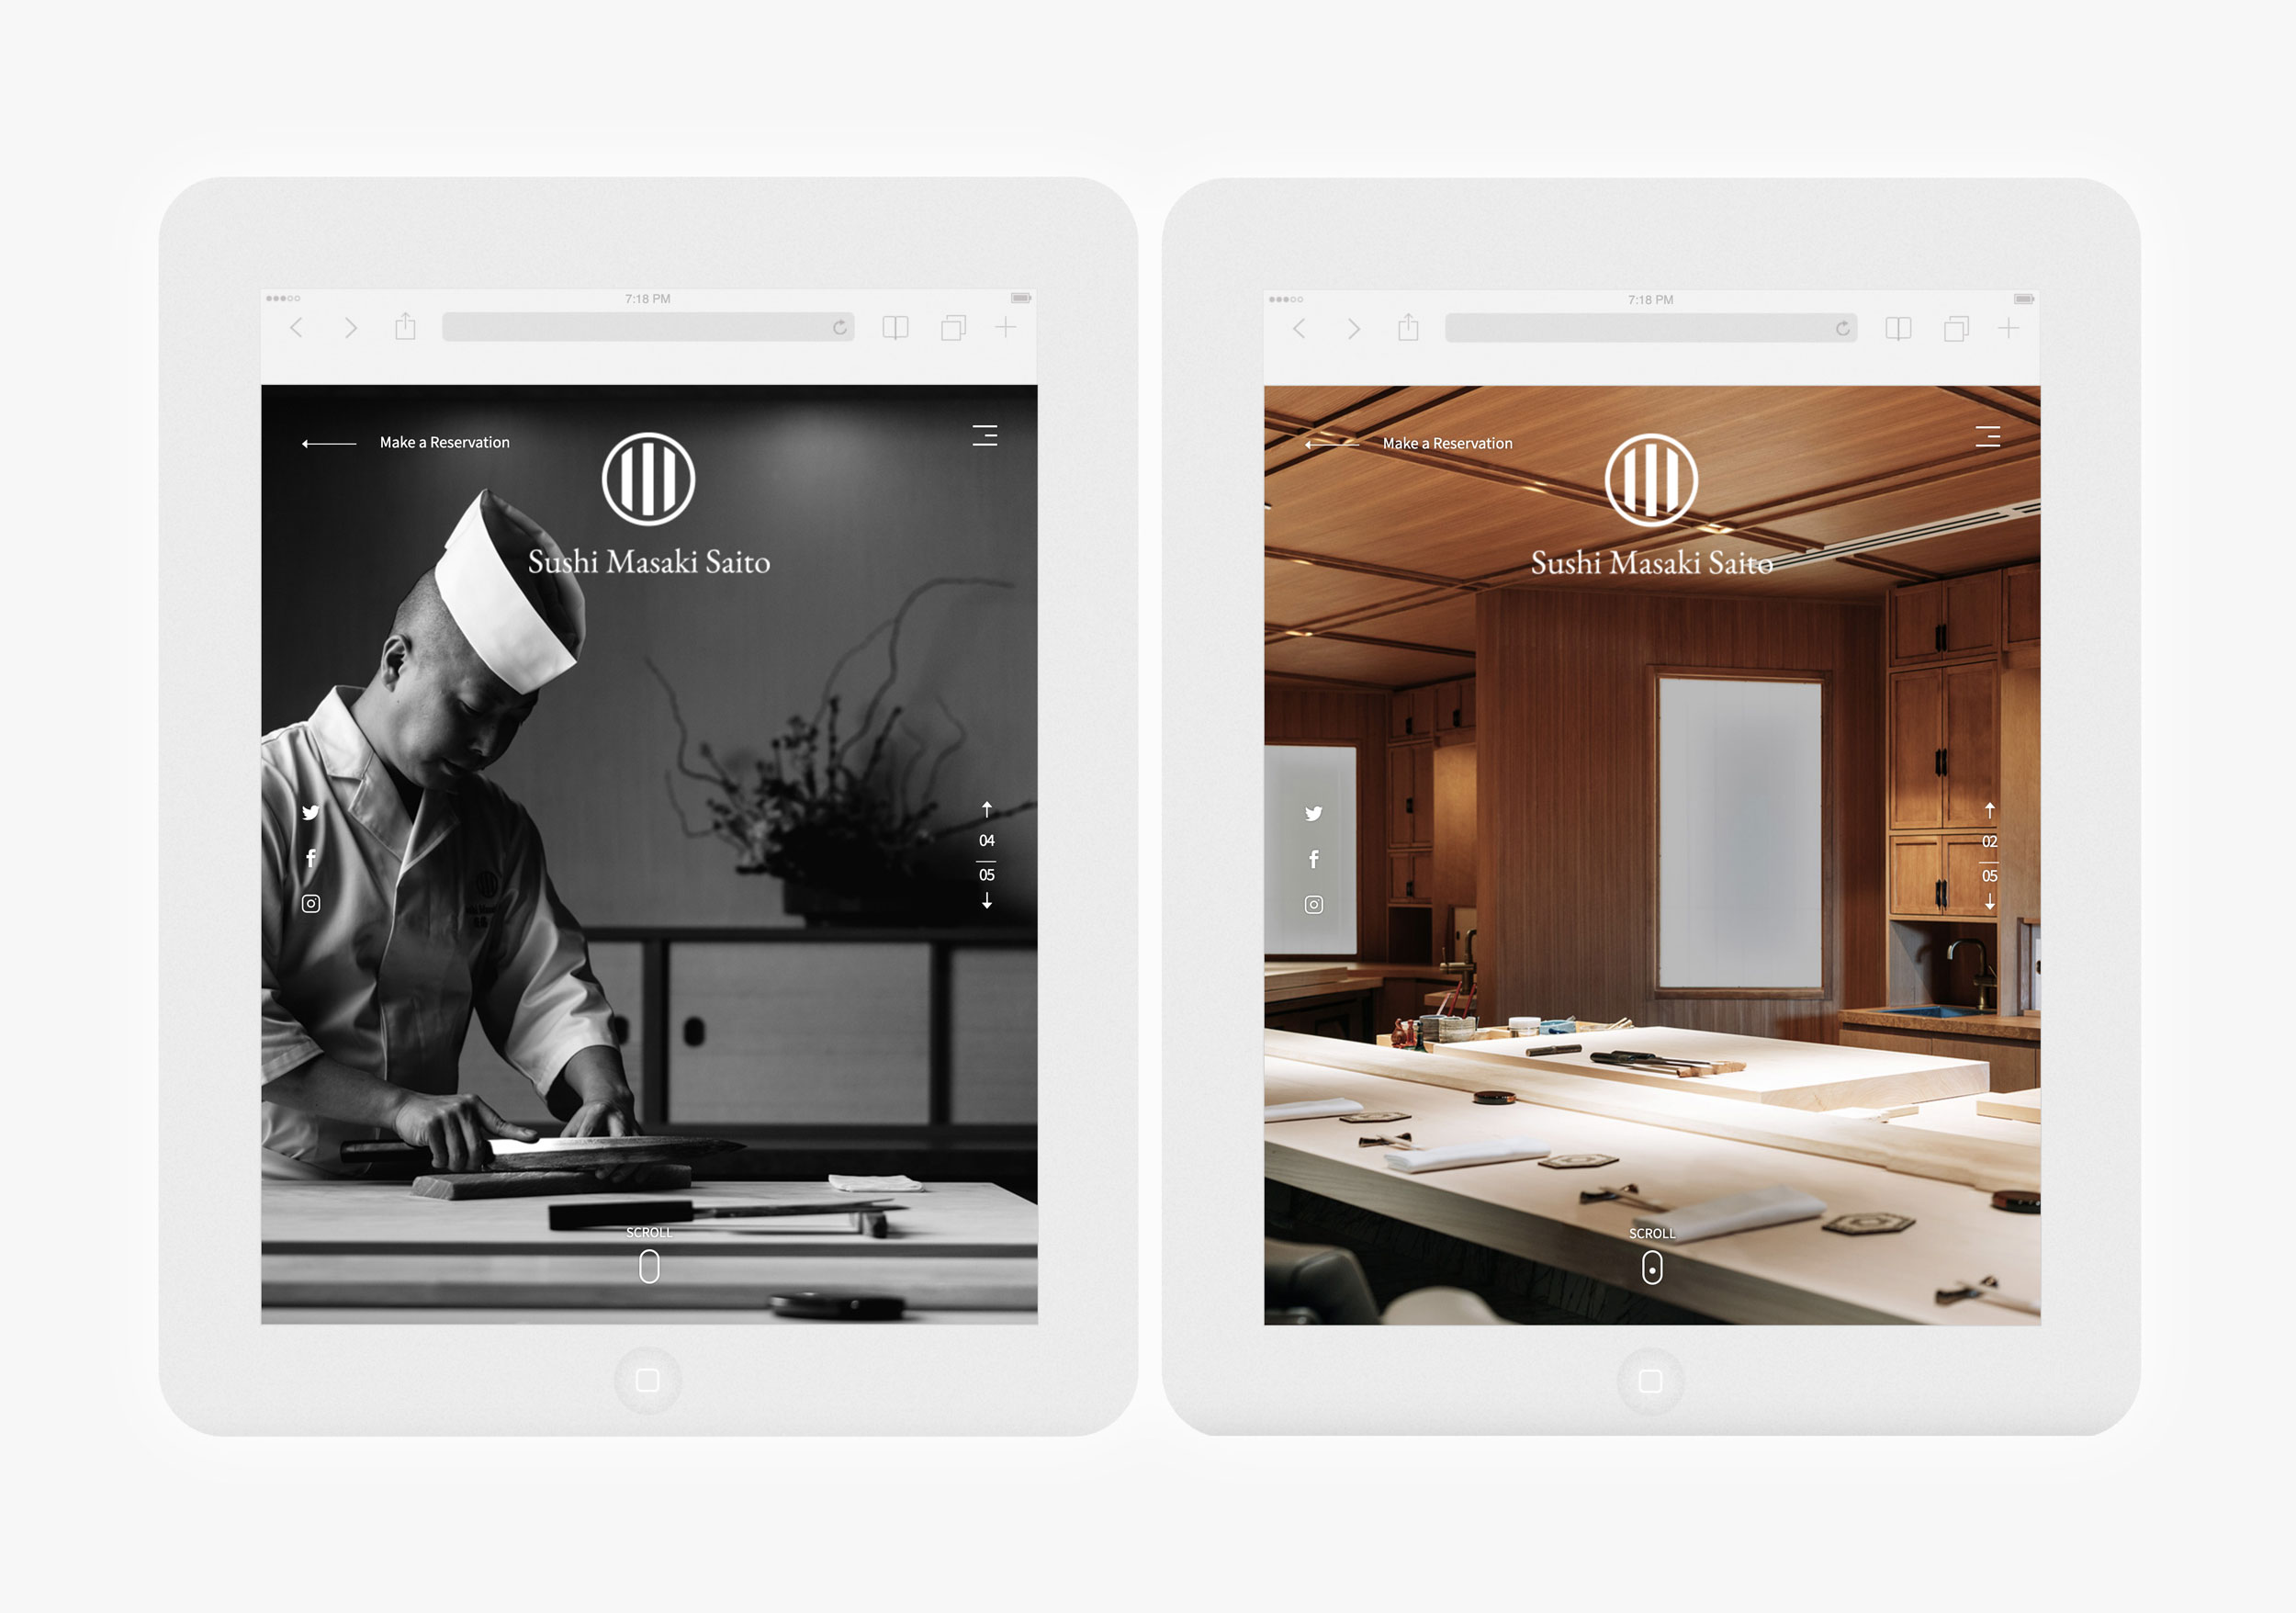 Sushi Website Design – Sushi Masaki Saito